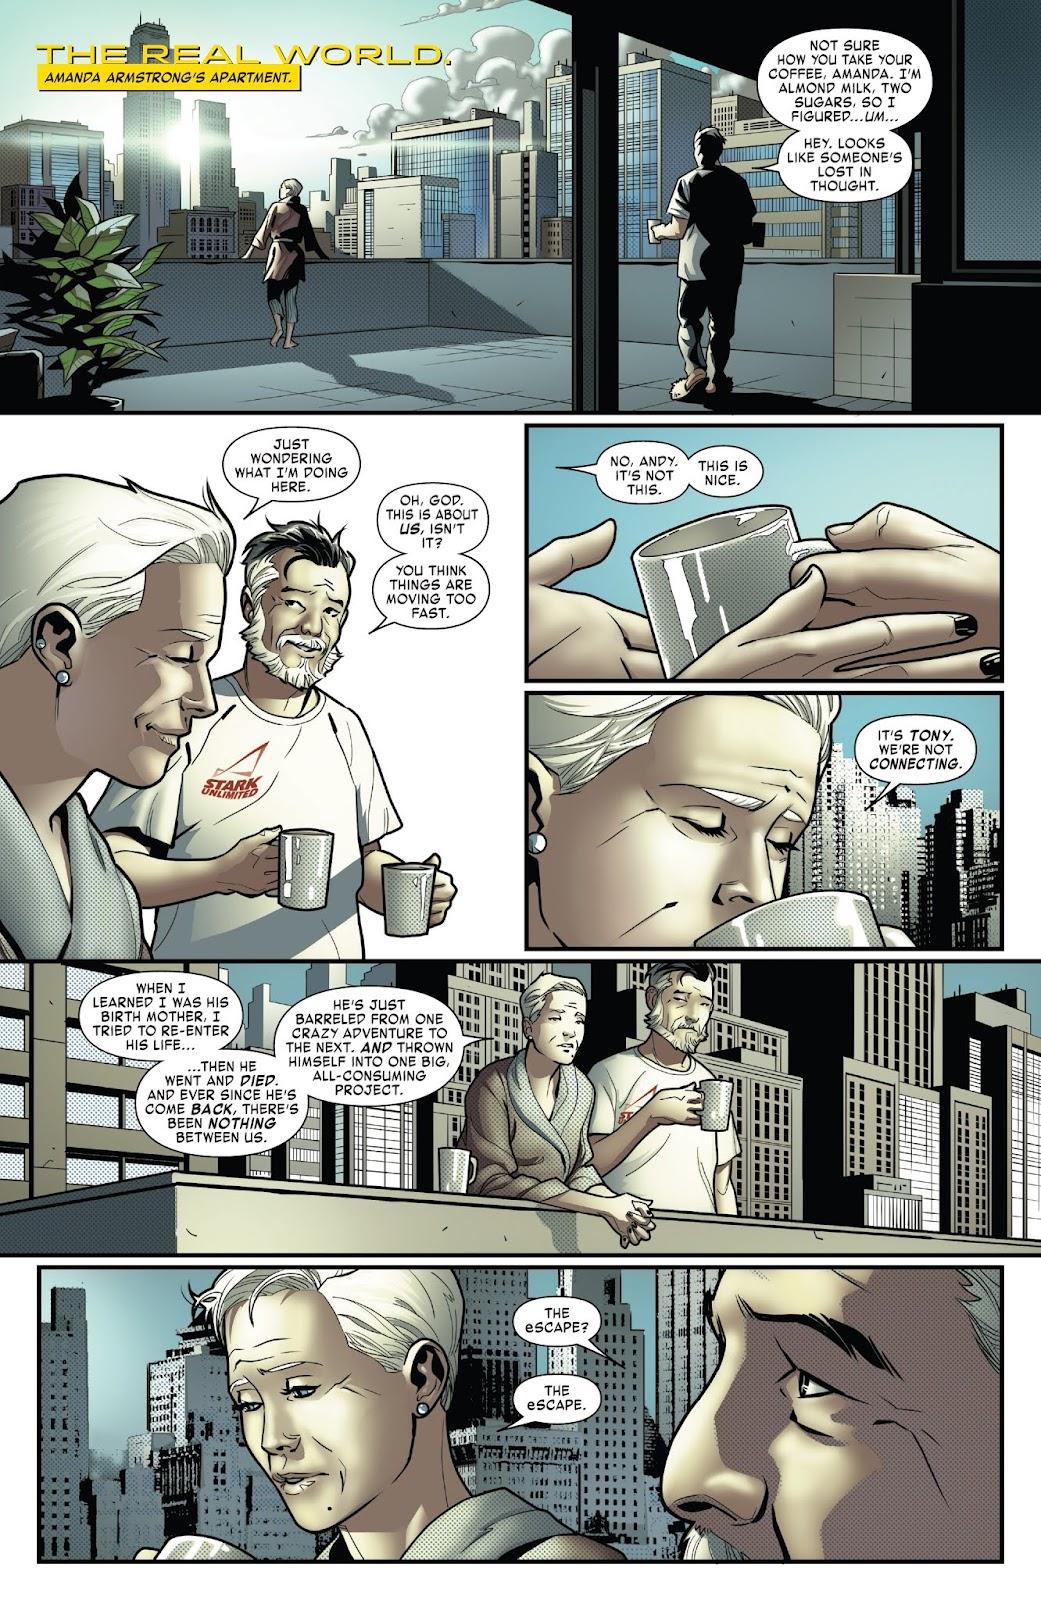 Read online Tony Stark: Iron Man comic -  Issue #6 - 3